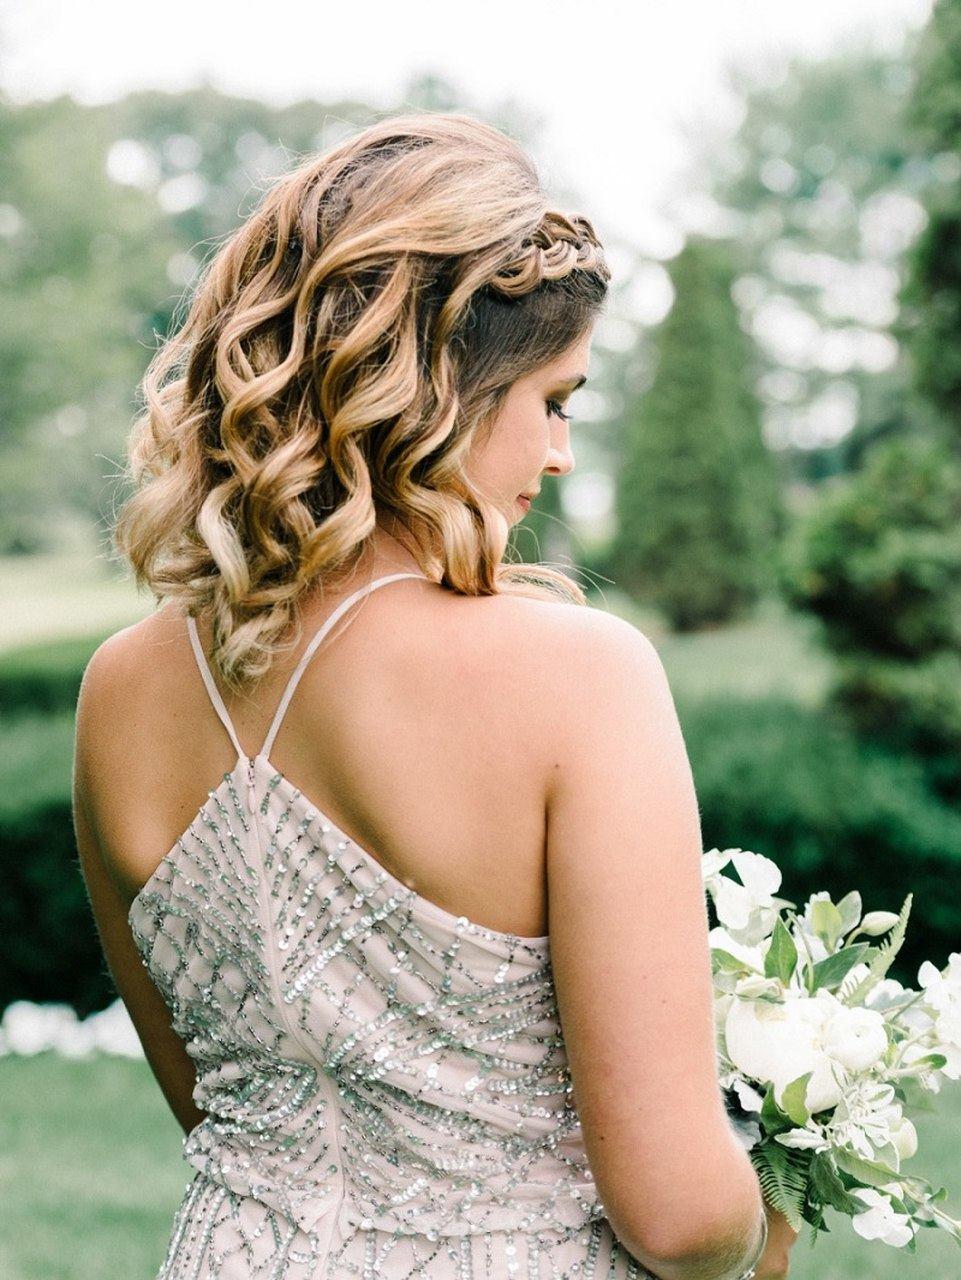 penteados para casamento para cabelos curtos